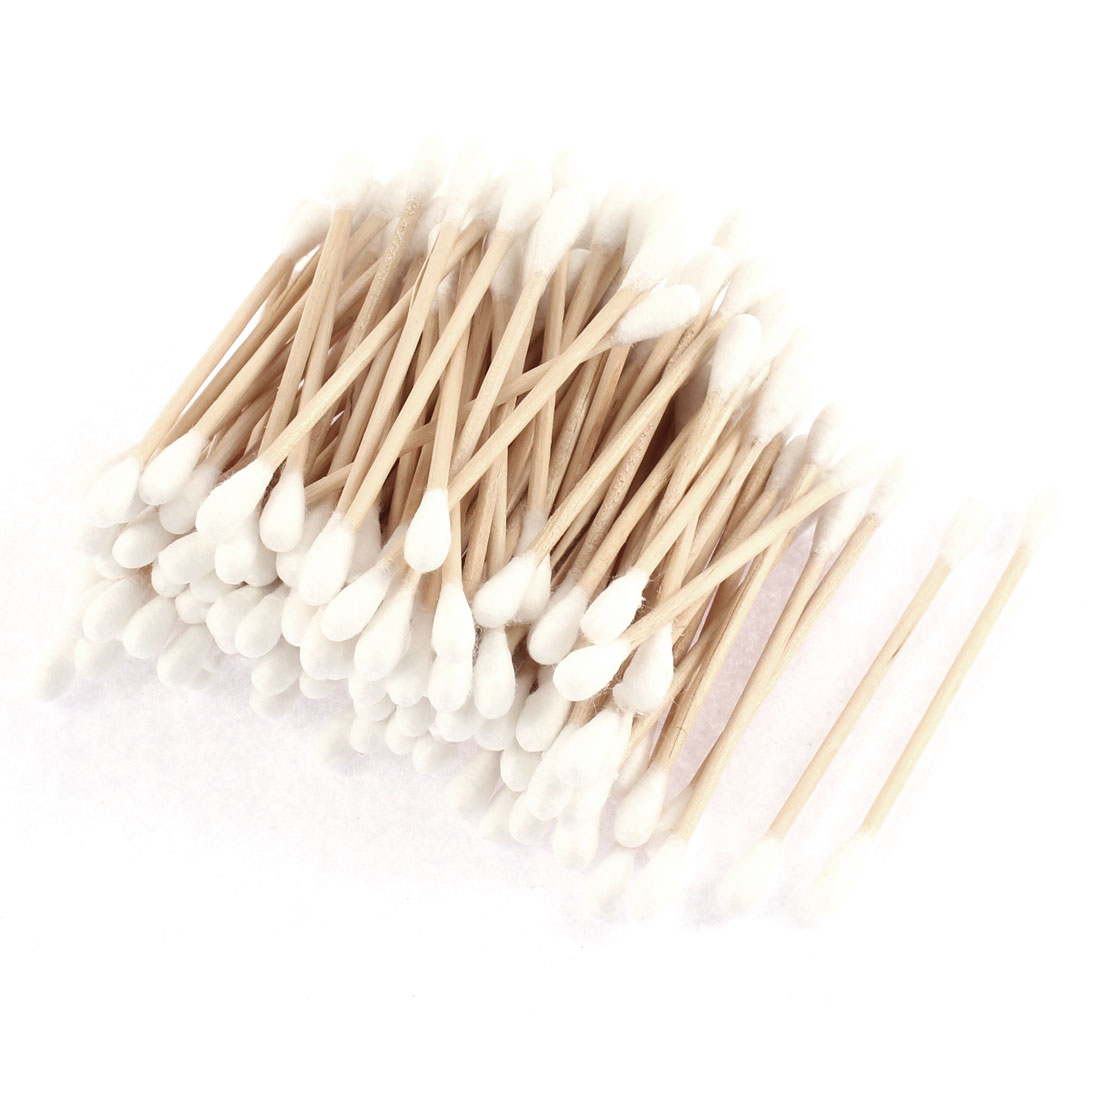 Wood Rod Double Head Ear Picks Cosmetic Removing Tool Cotton Swab Bud 100 Pcs